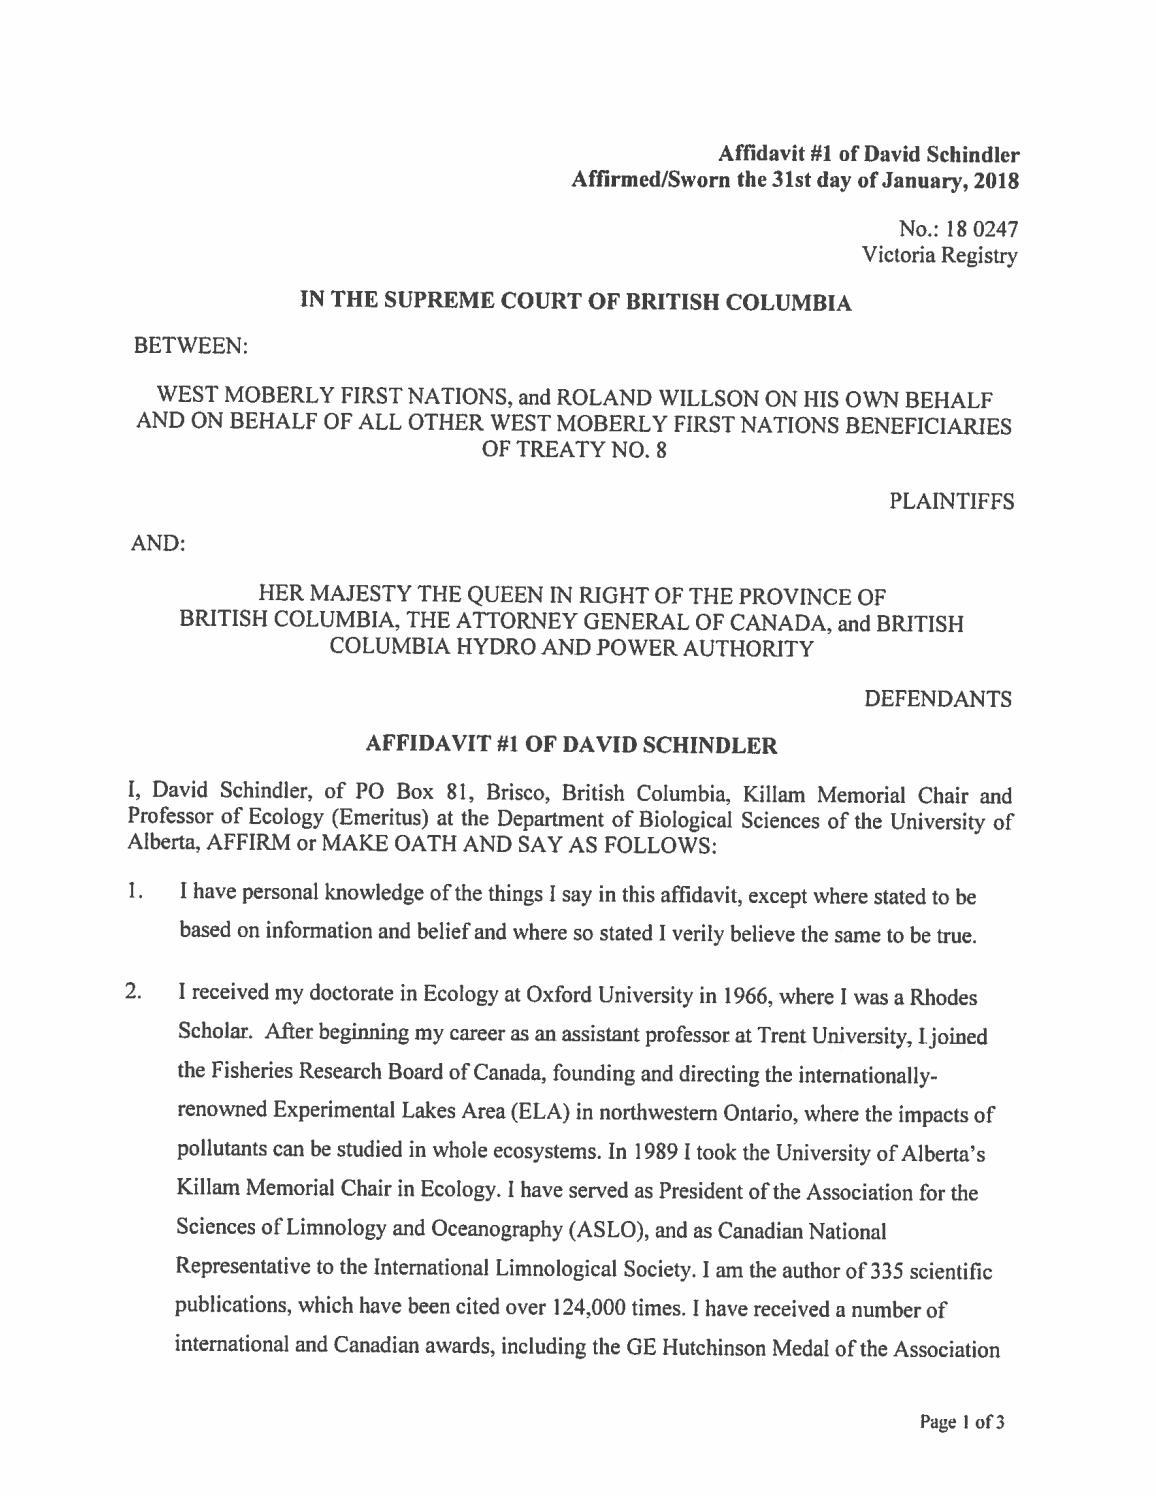 Affidavit 1 Of David Schindler By Sagelegal